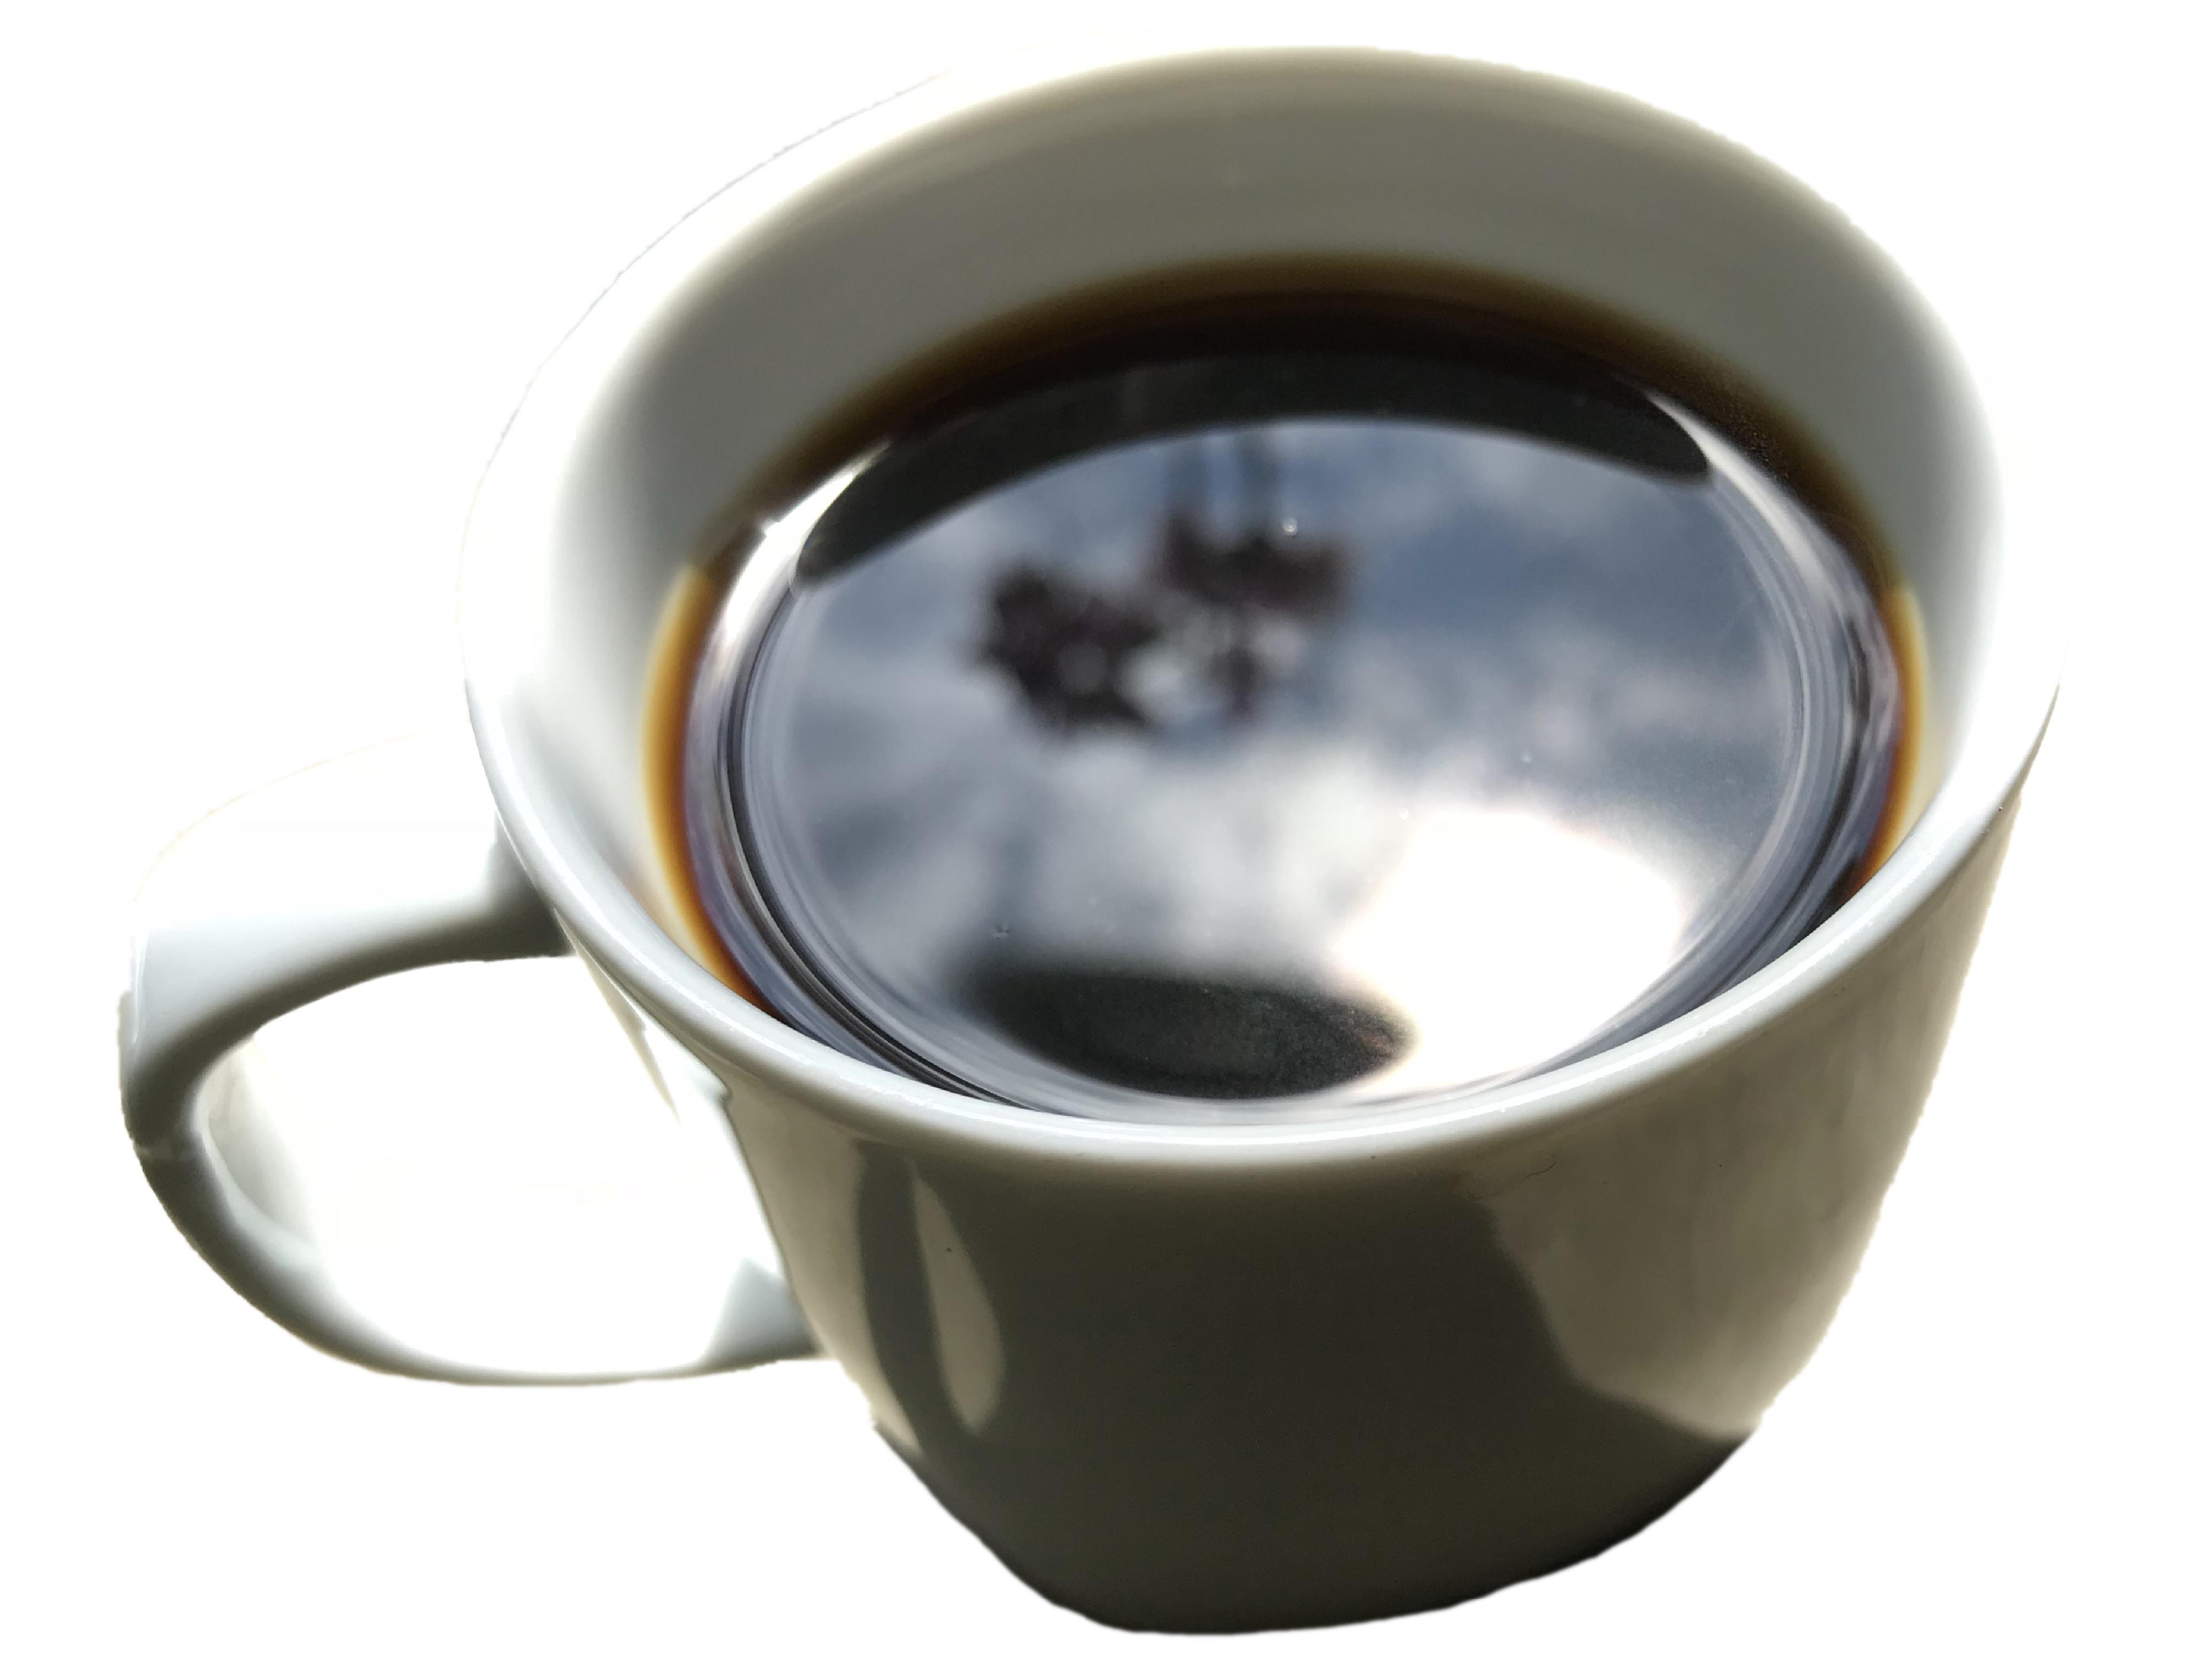 rwandan coffee, specialty coffee, empowerment, best coffee, good coffee,